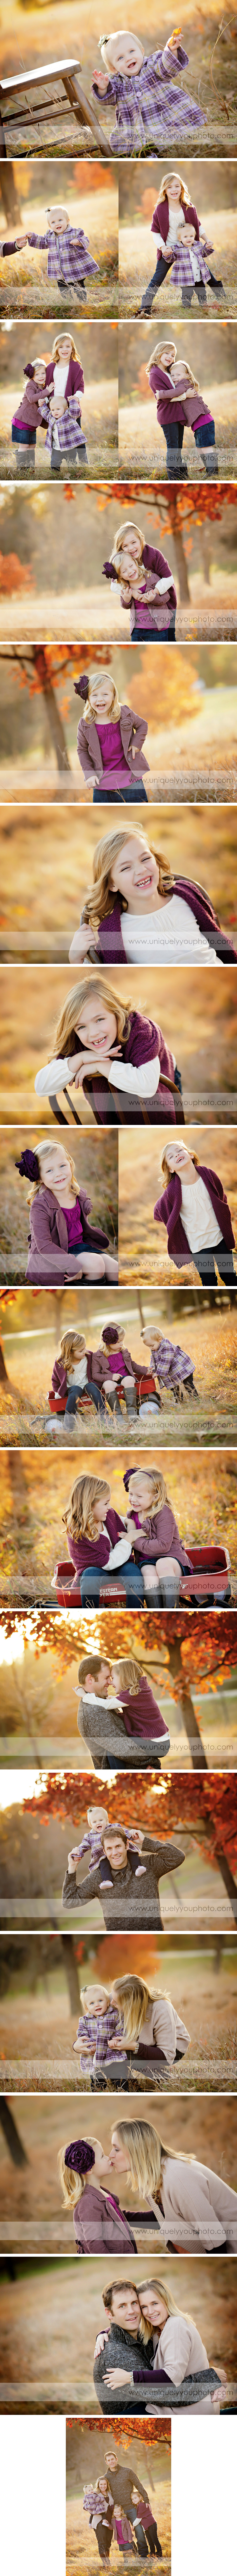 lincolnnebraskafamilyphotographer